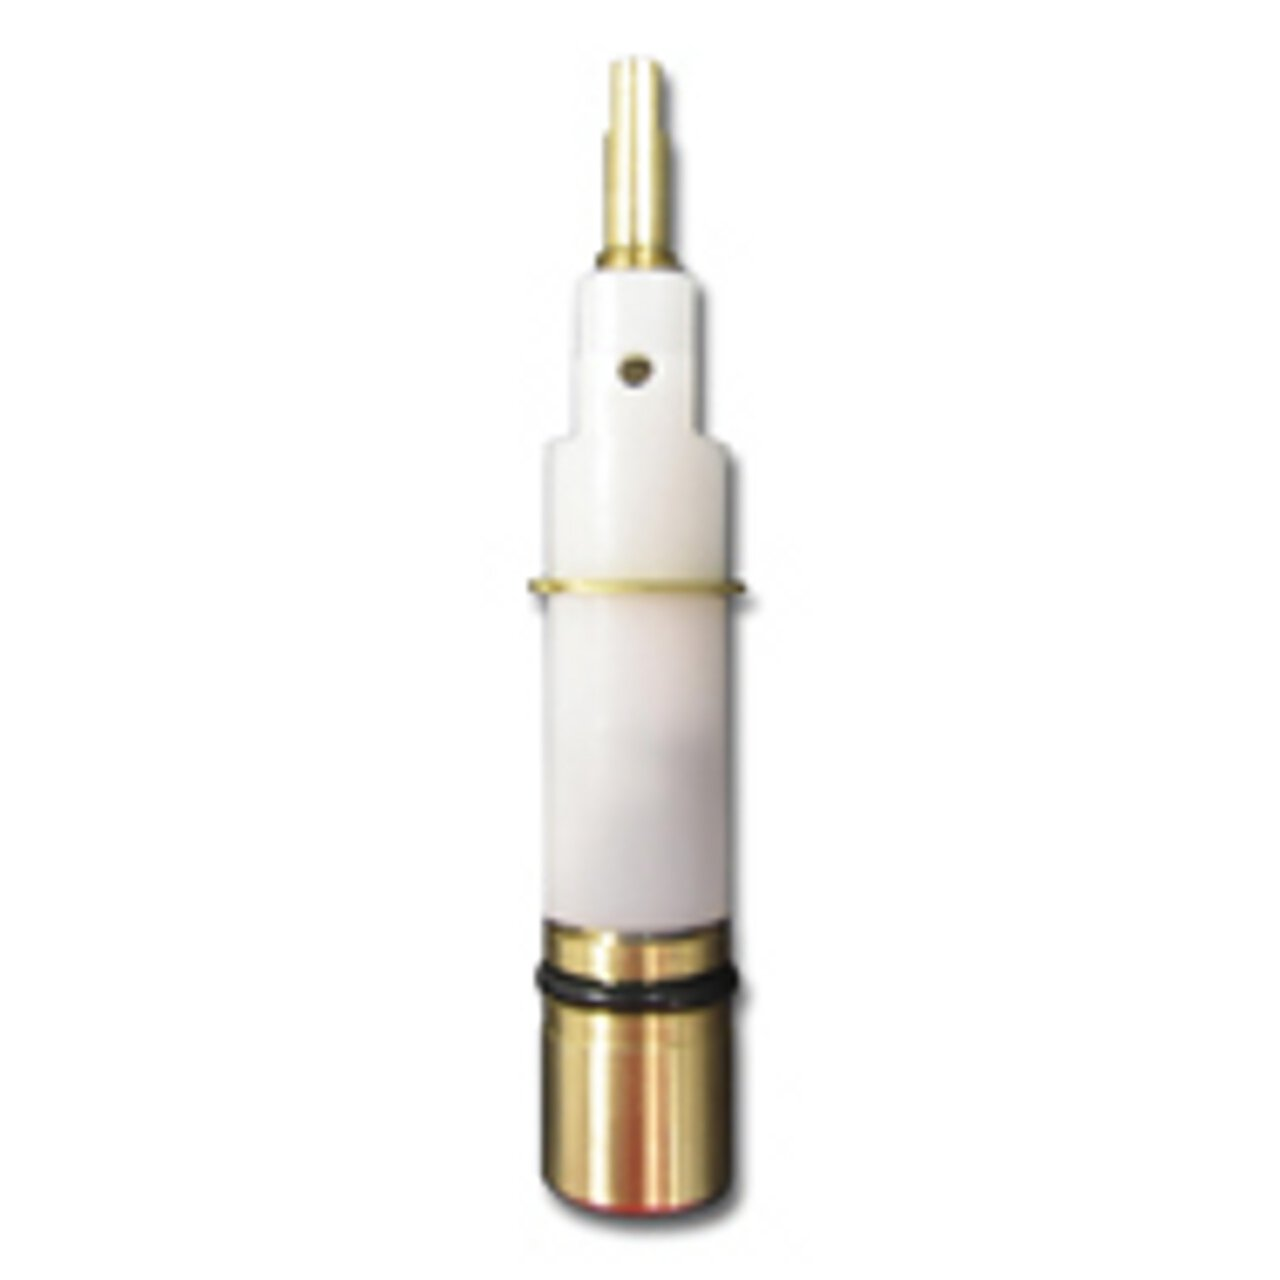 Kissler 711-7045 Mixet Mixing Replacement Shower Cartridge Kissler /& Co.